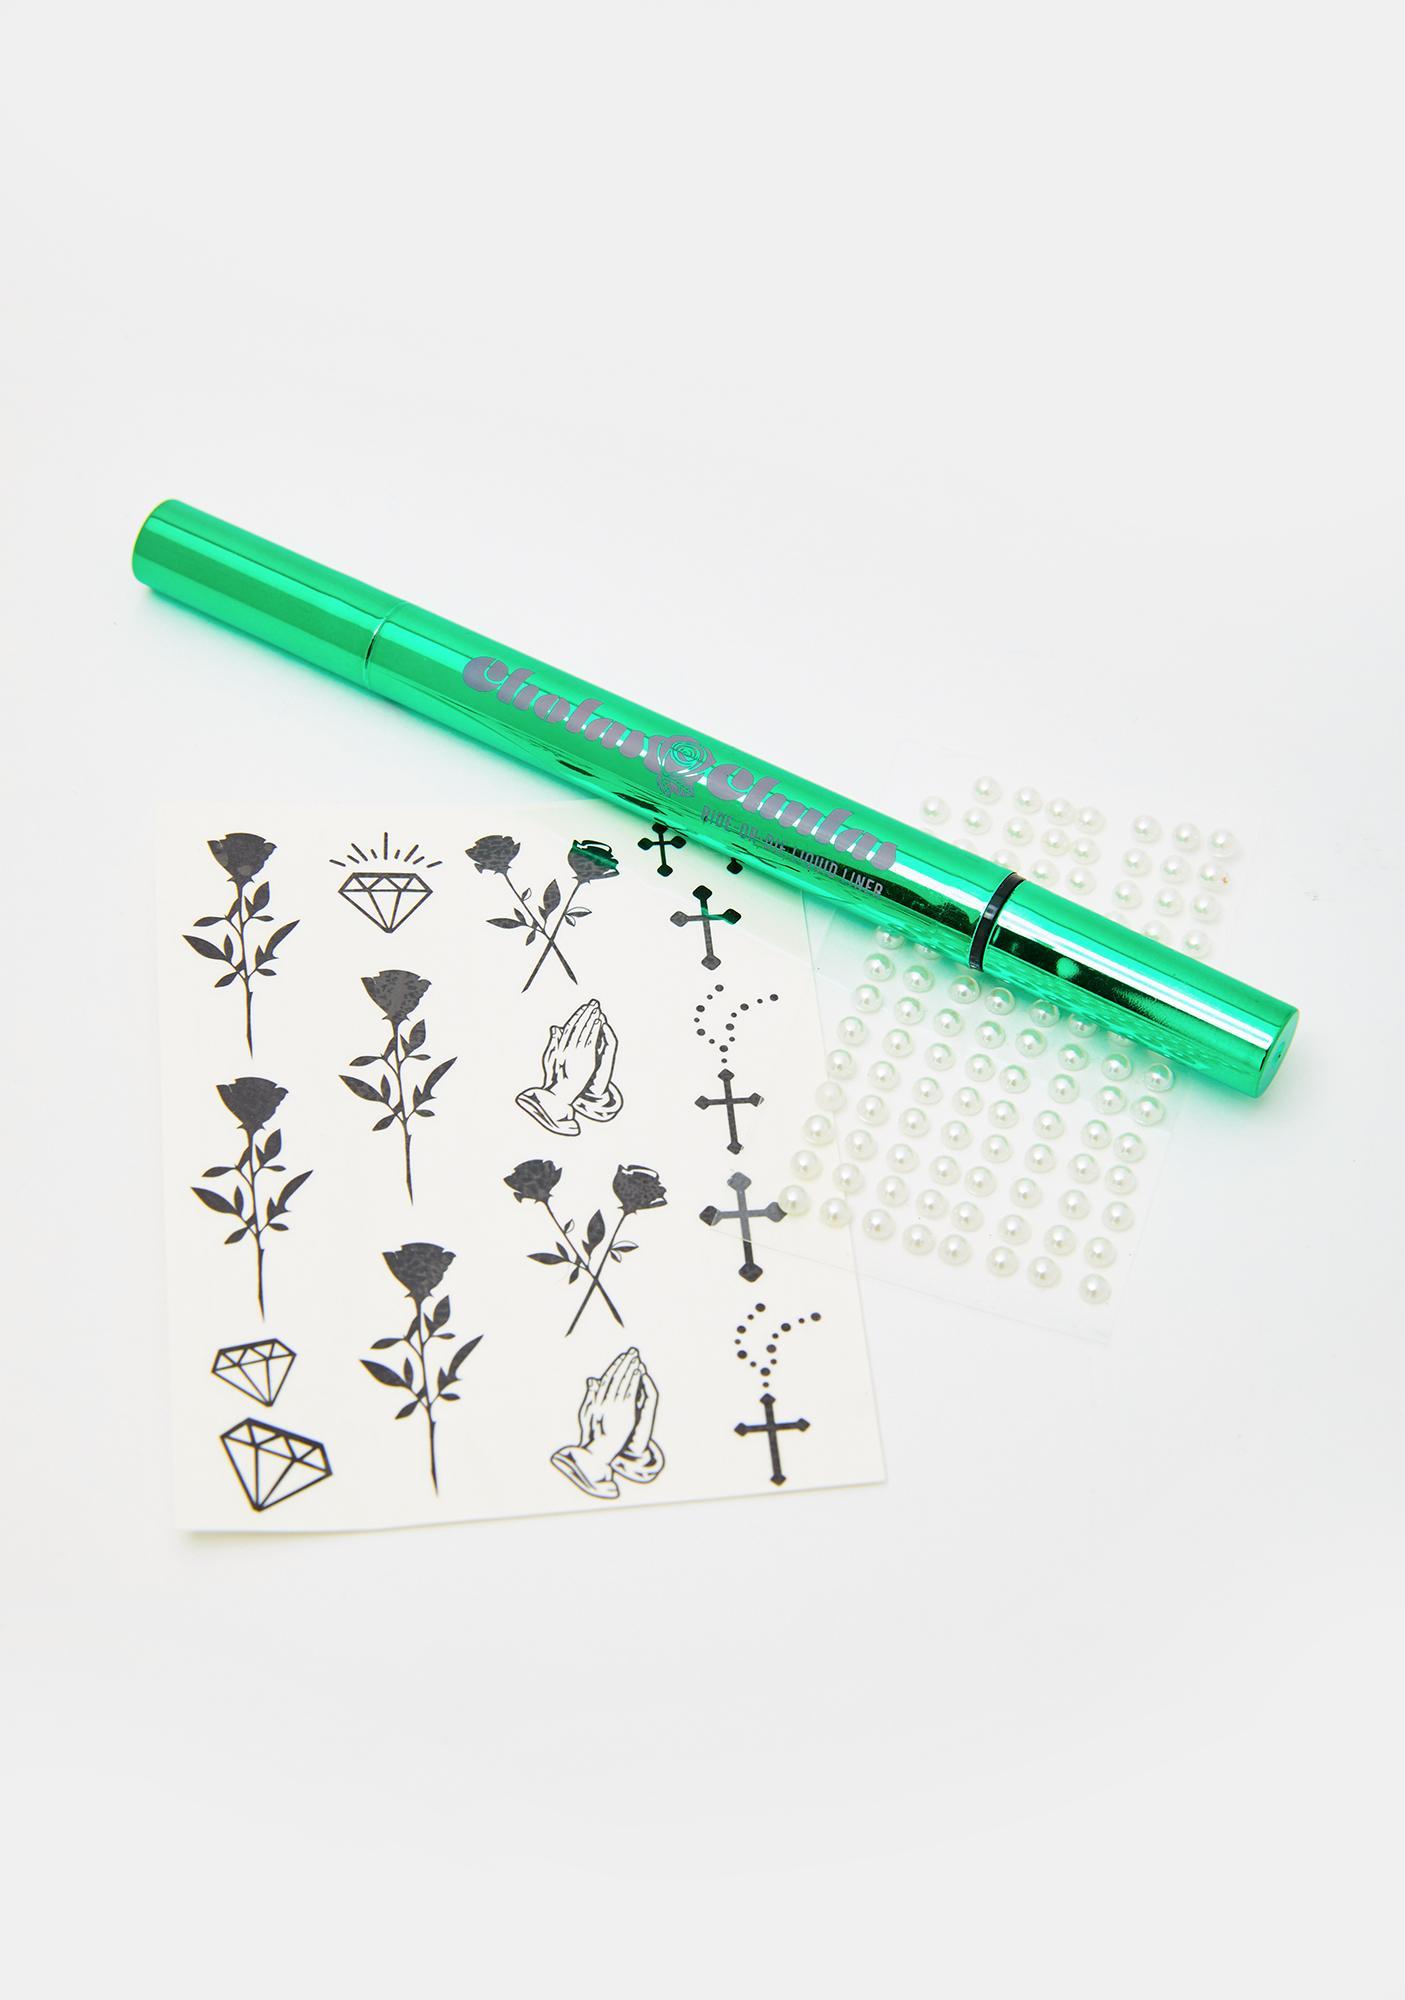 Cholas x Chulas Mi Corazon Stamp Liner N Face Sticker Set